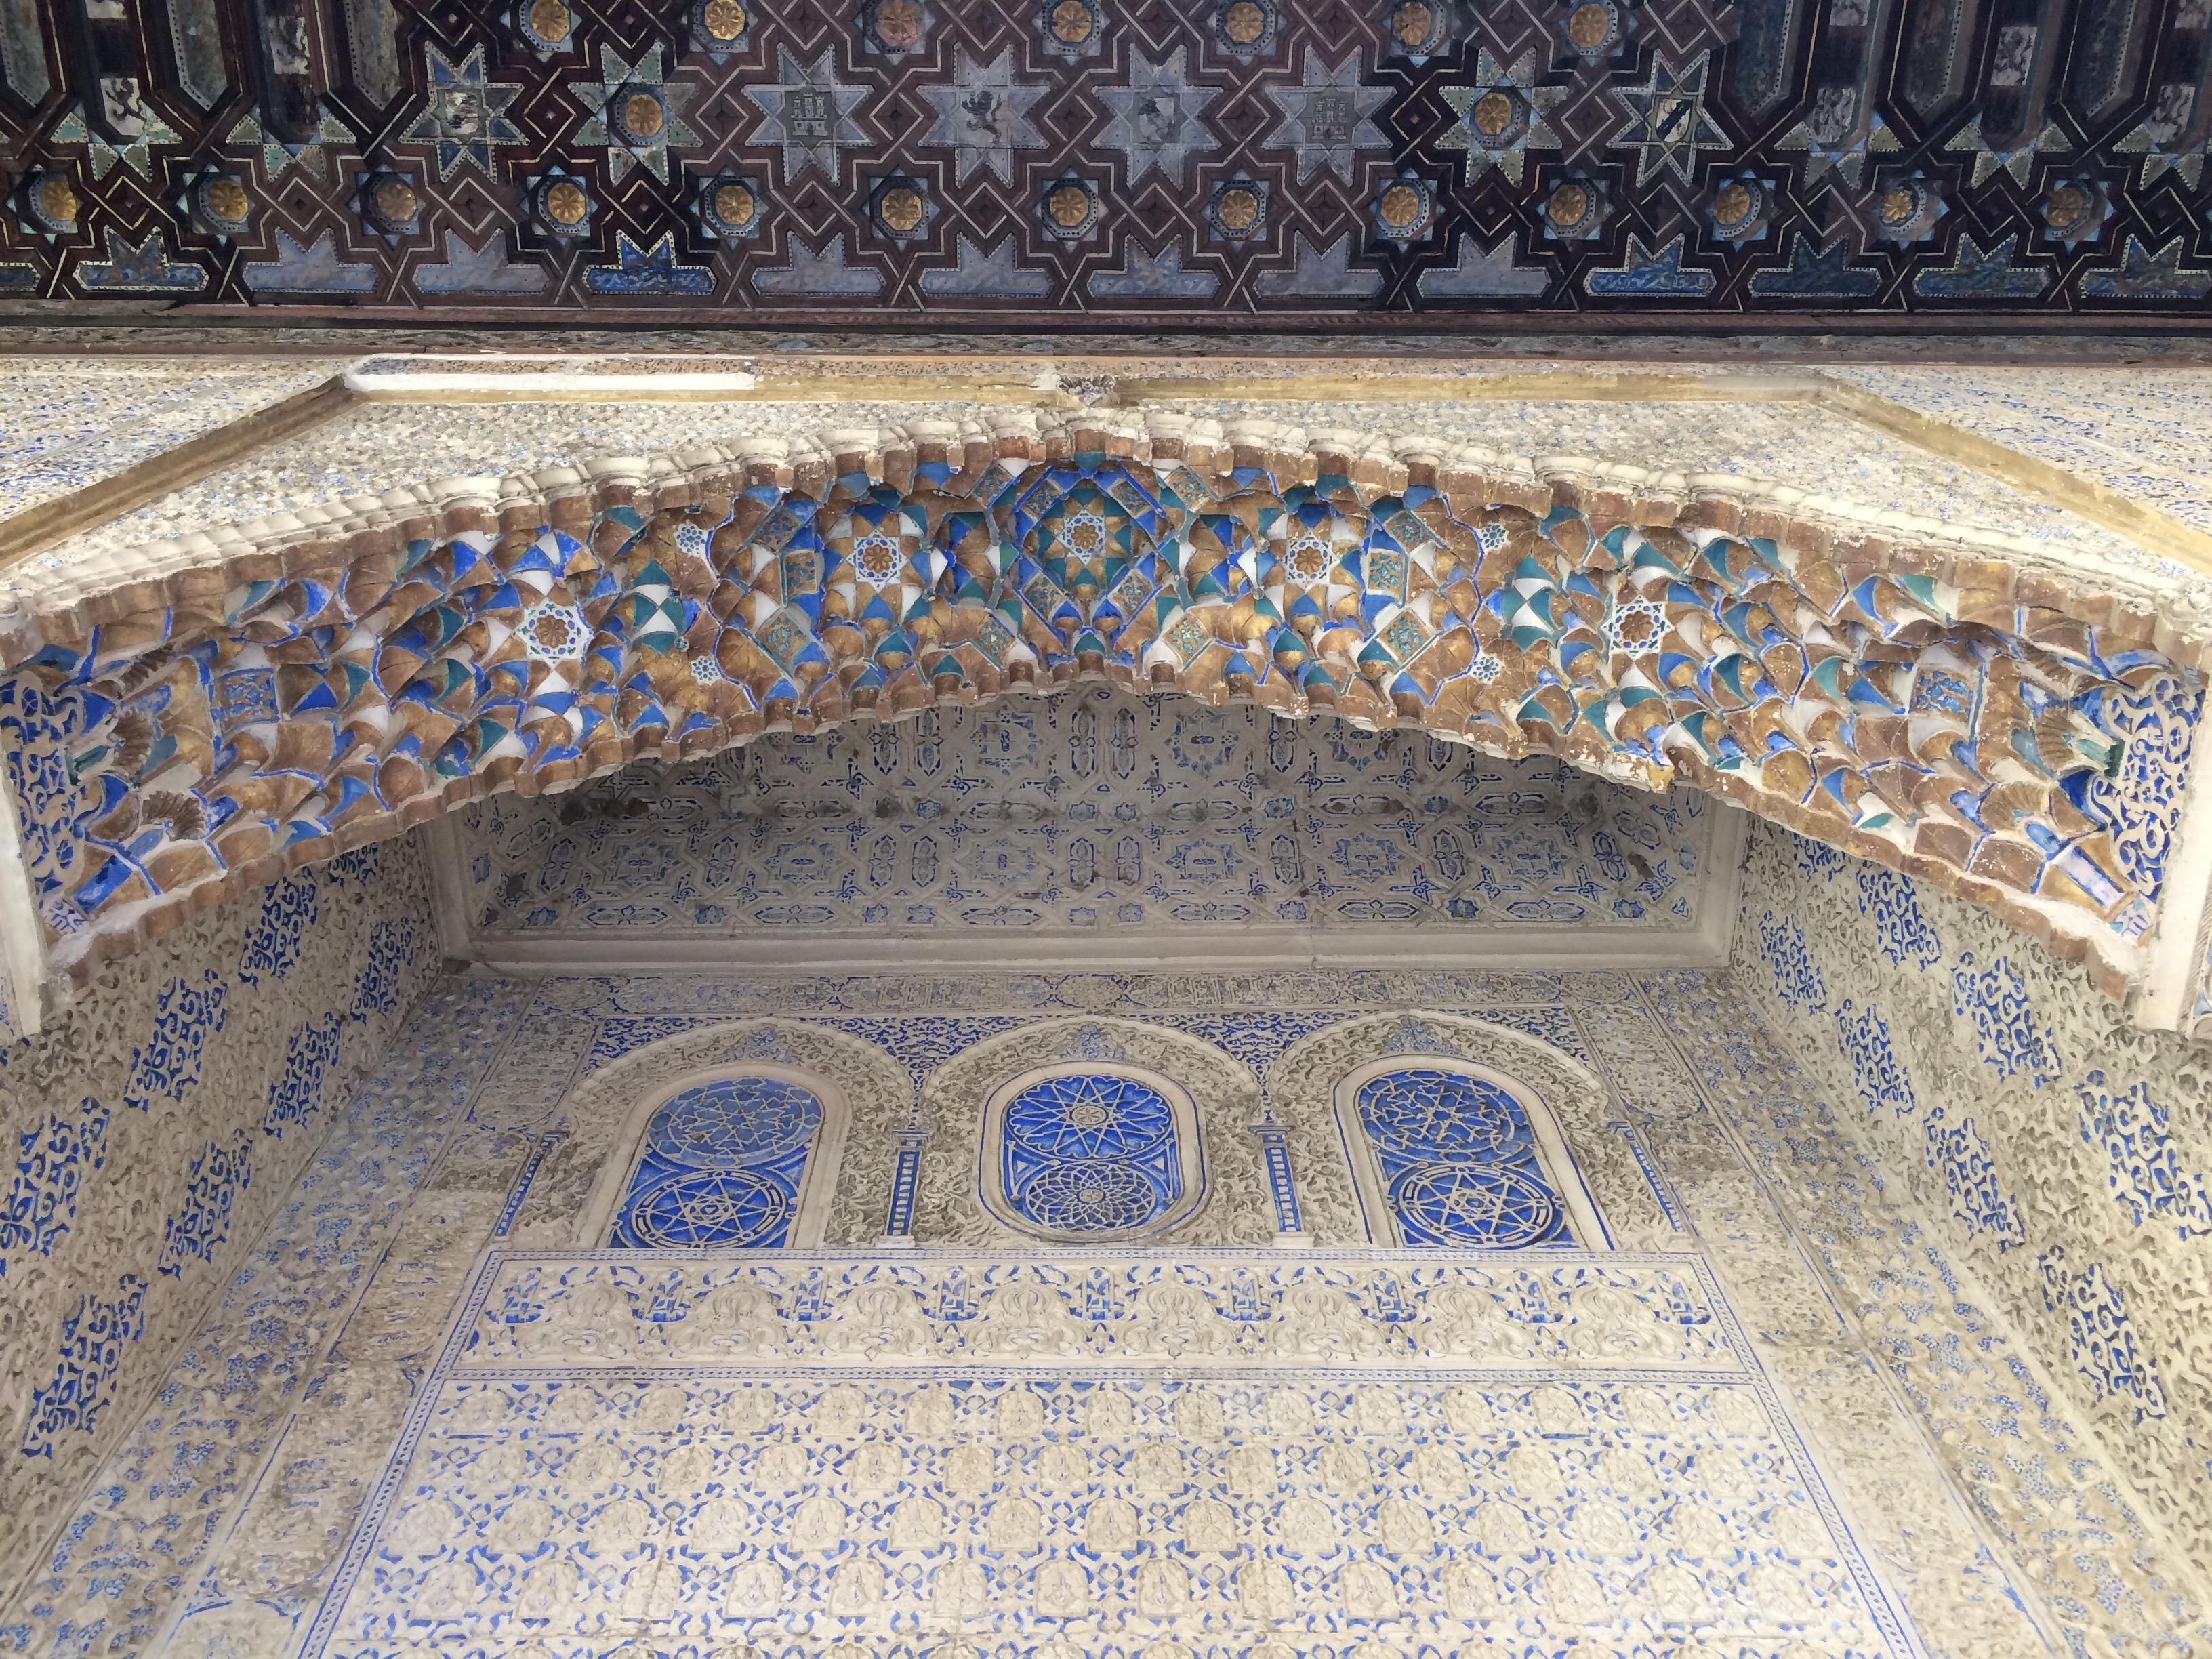 Seville - Alcazar- exquisite detailing